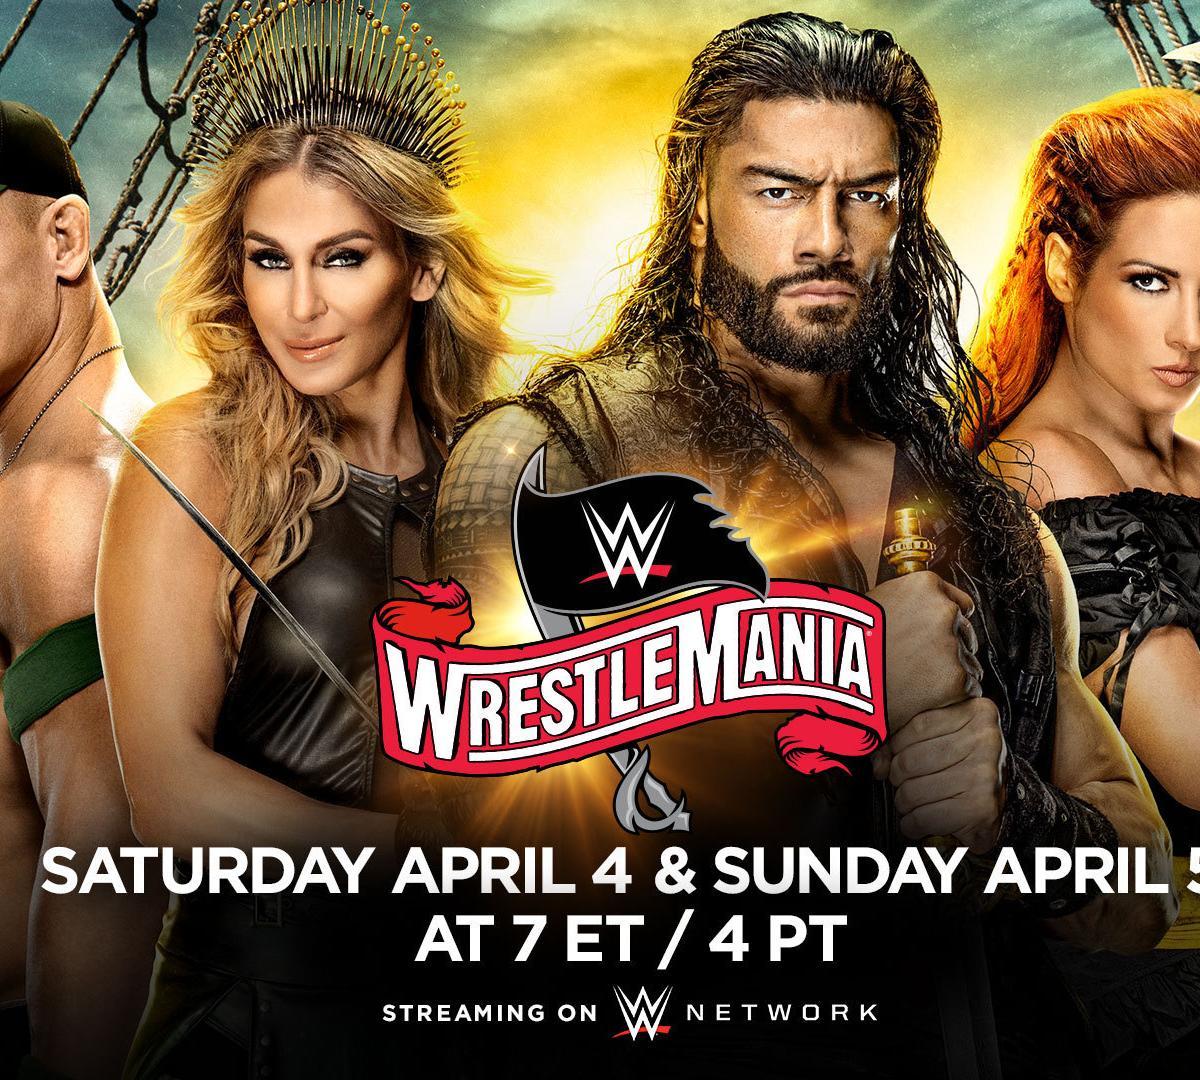 Enjoy WrestleMania 36 Live online